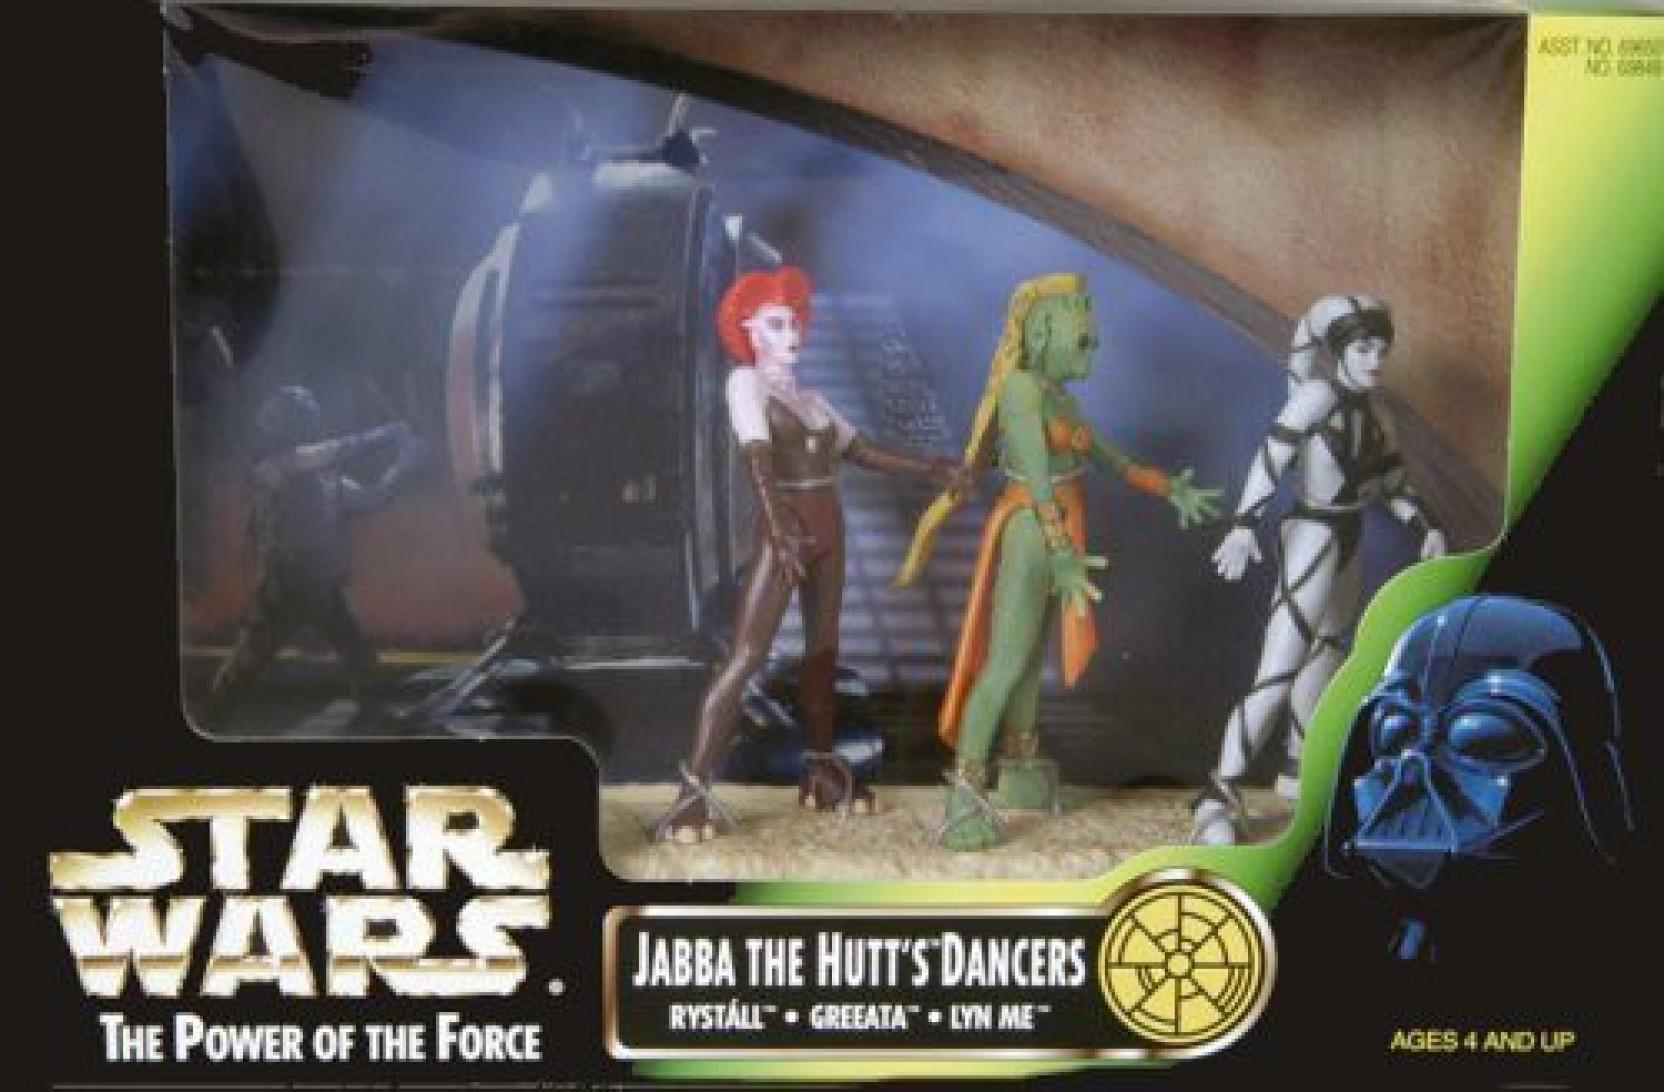 jabba-the-hutt-s-dancers-3-pack-cinema-scene-by-star-wars-original-imaffrt2wrhgafak.jpeg